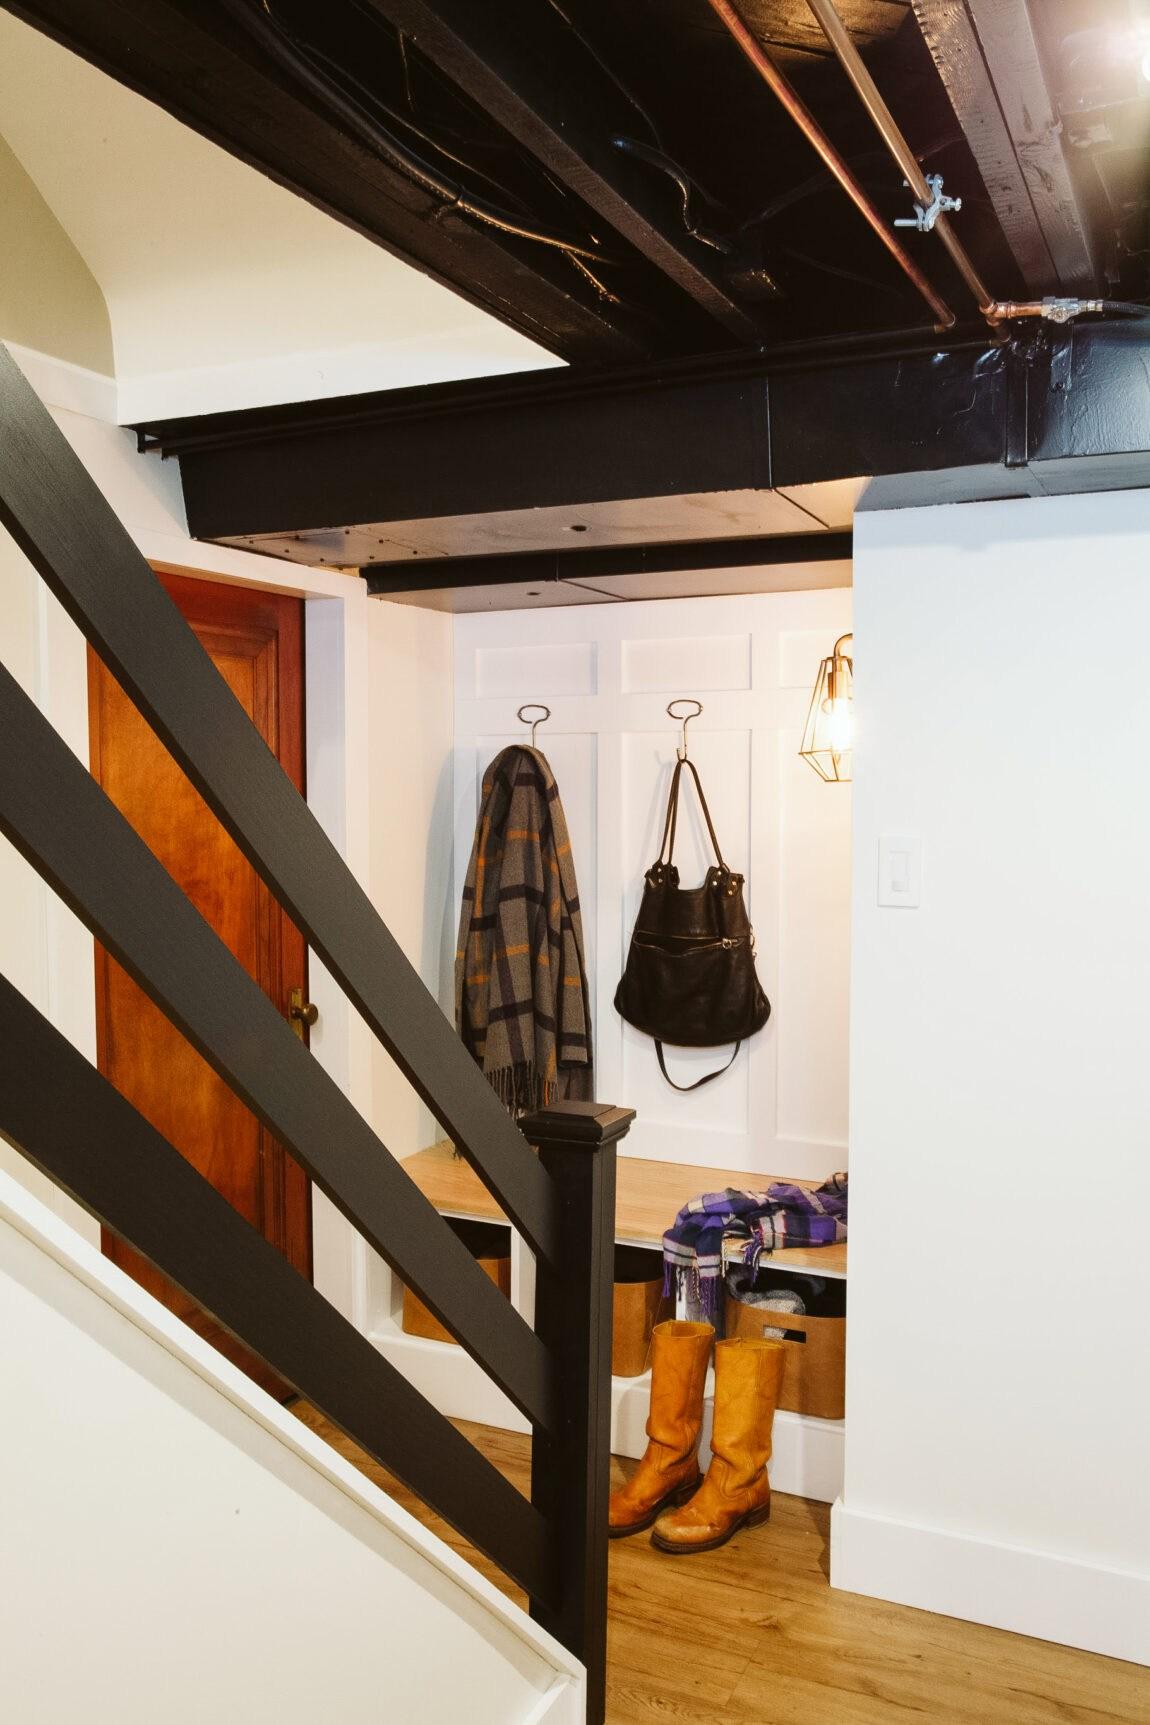 How To Build A Modern Horizontal Railing Clark Aldine | Stair Railings Near Me | Steel | Metal Stair Parts | Deck | Spindles | Deck Railing